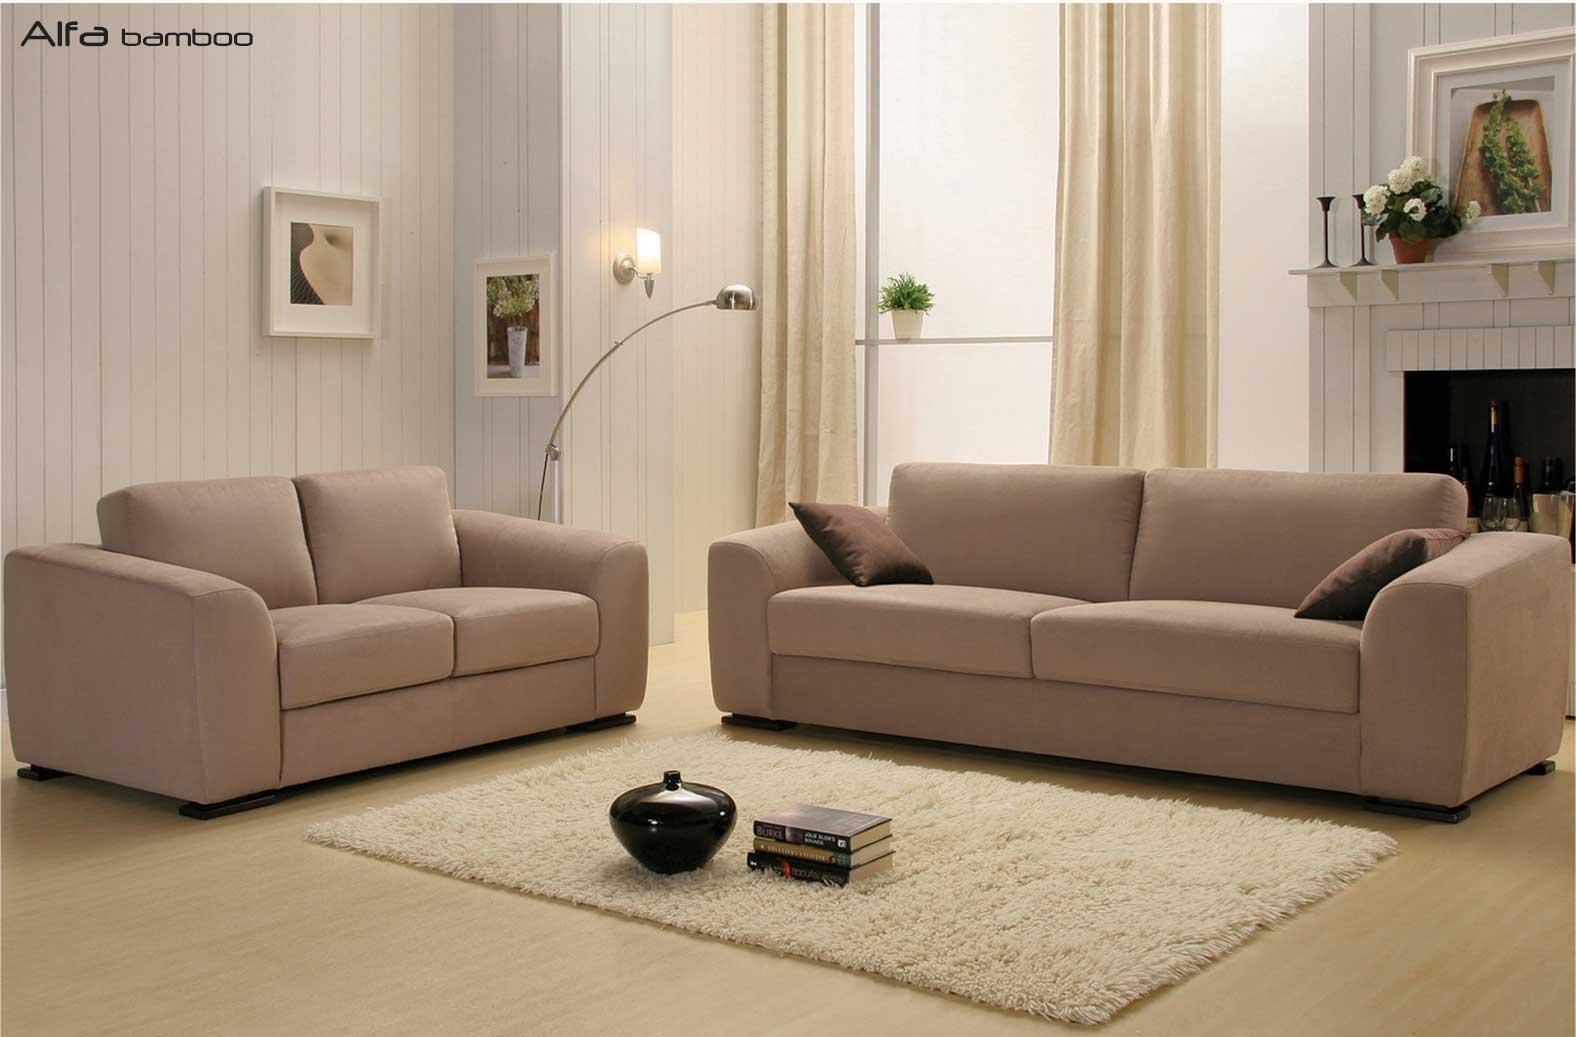 LA Furniture Blog » Blog Archive » Bring Harmony into Life via ...